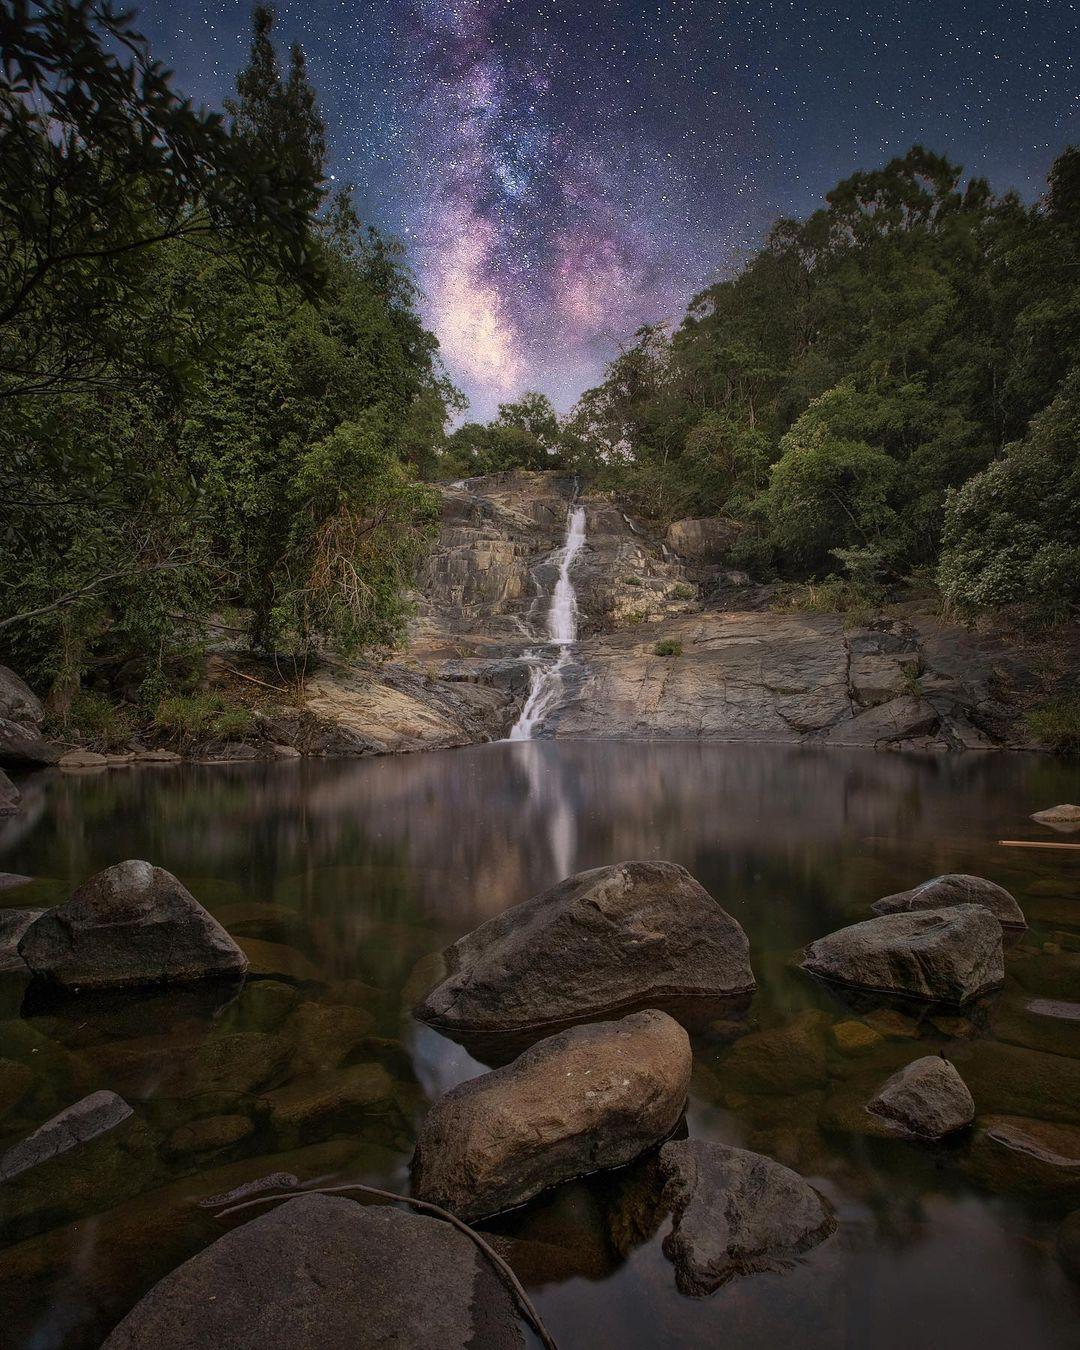 Milky Way in Dak Lak